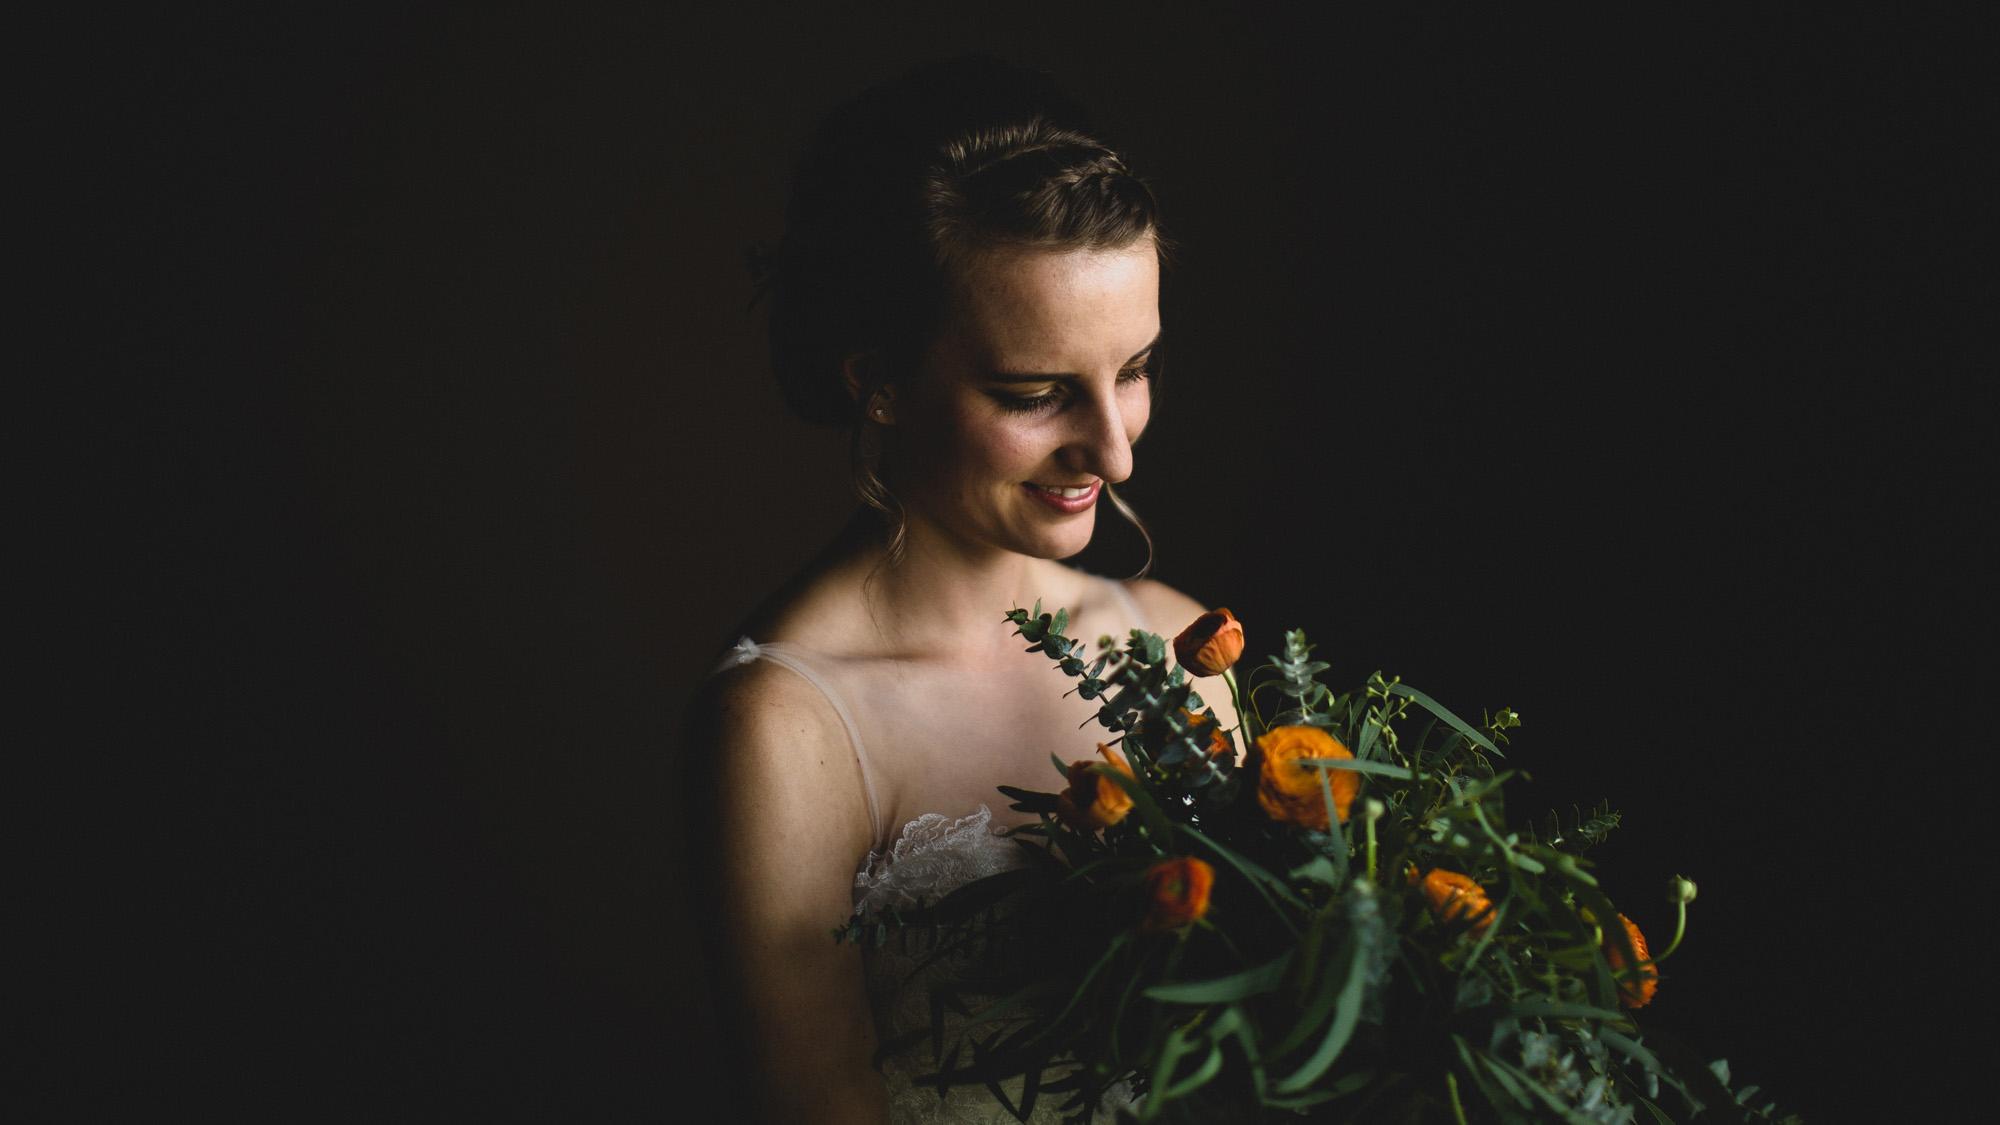 alec_vanderboom_springfield_missouri_wedding-0040.jpg